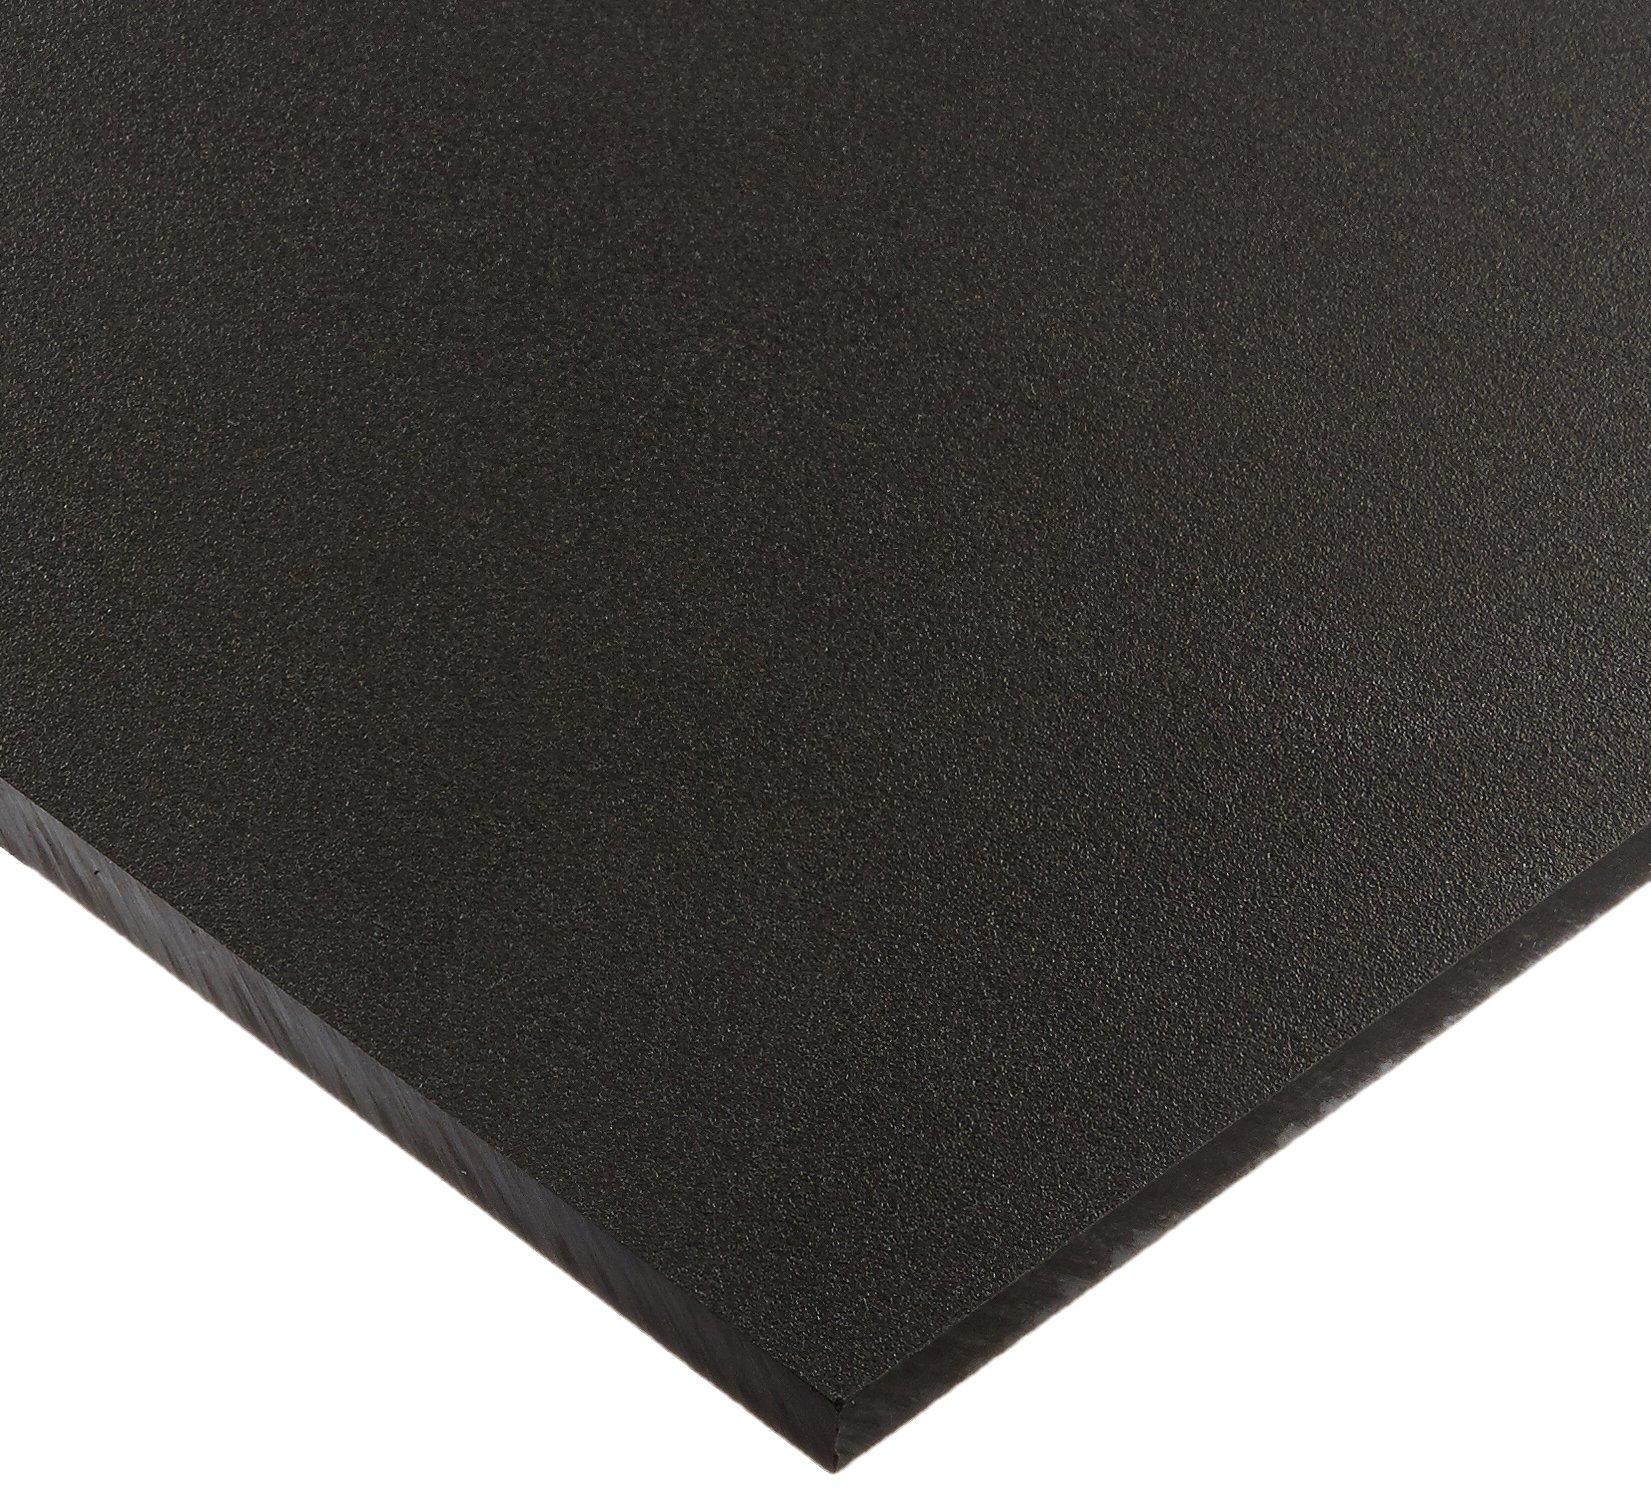 Seaboard High Density Polyethylene Sheet, Matte Finish, 1/2'' Thick, 12'' Length x 24'' Width, Black